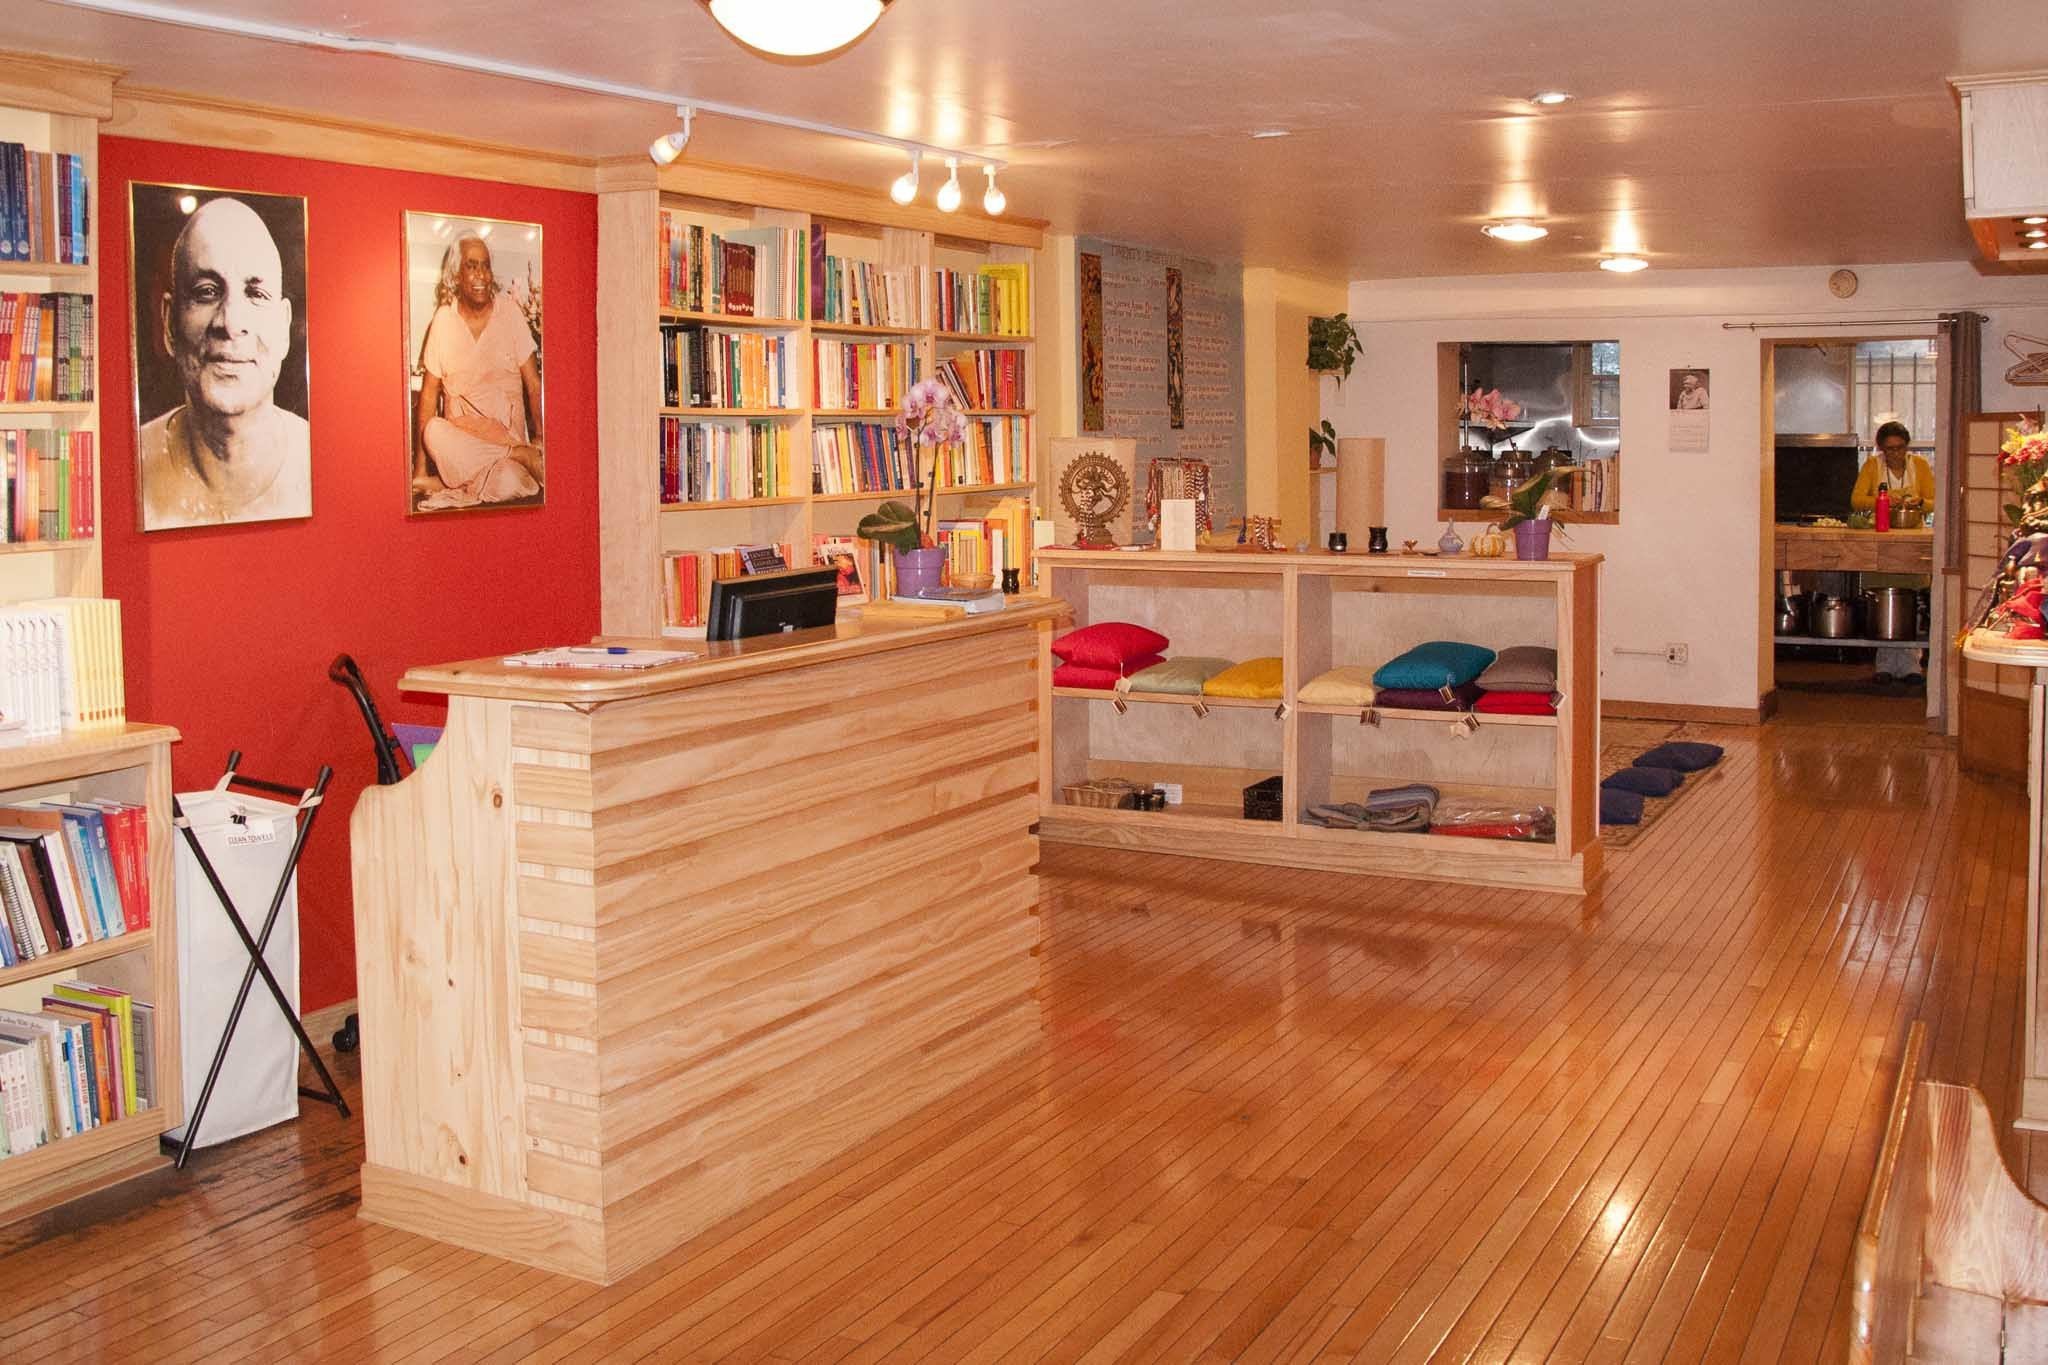 Sivananda Yoga Center